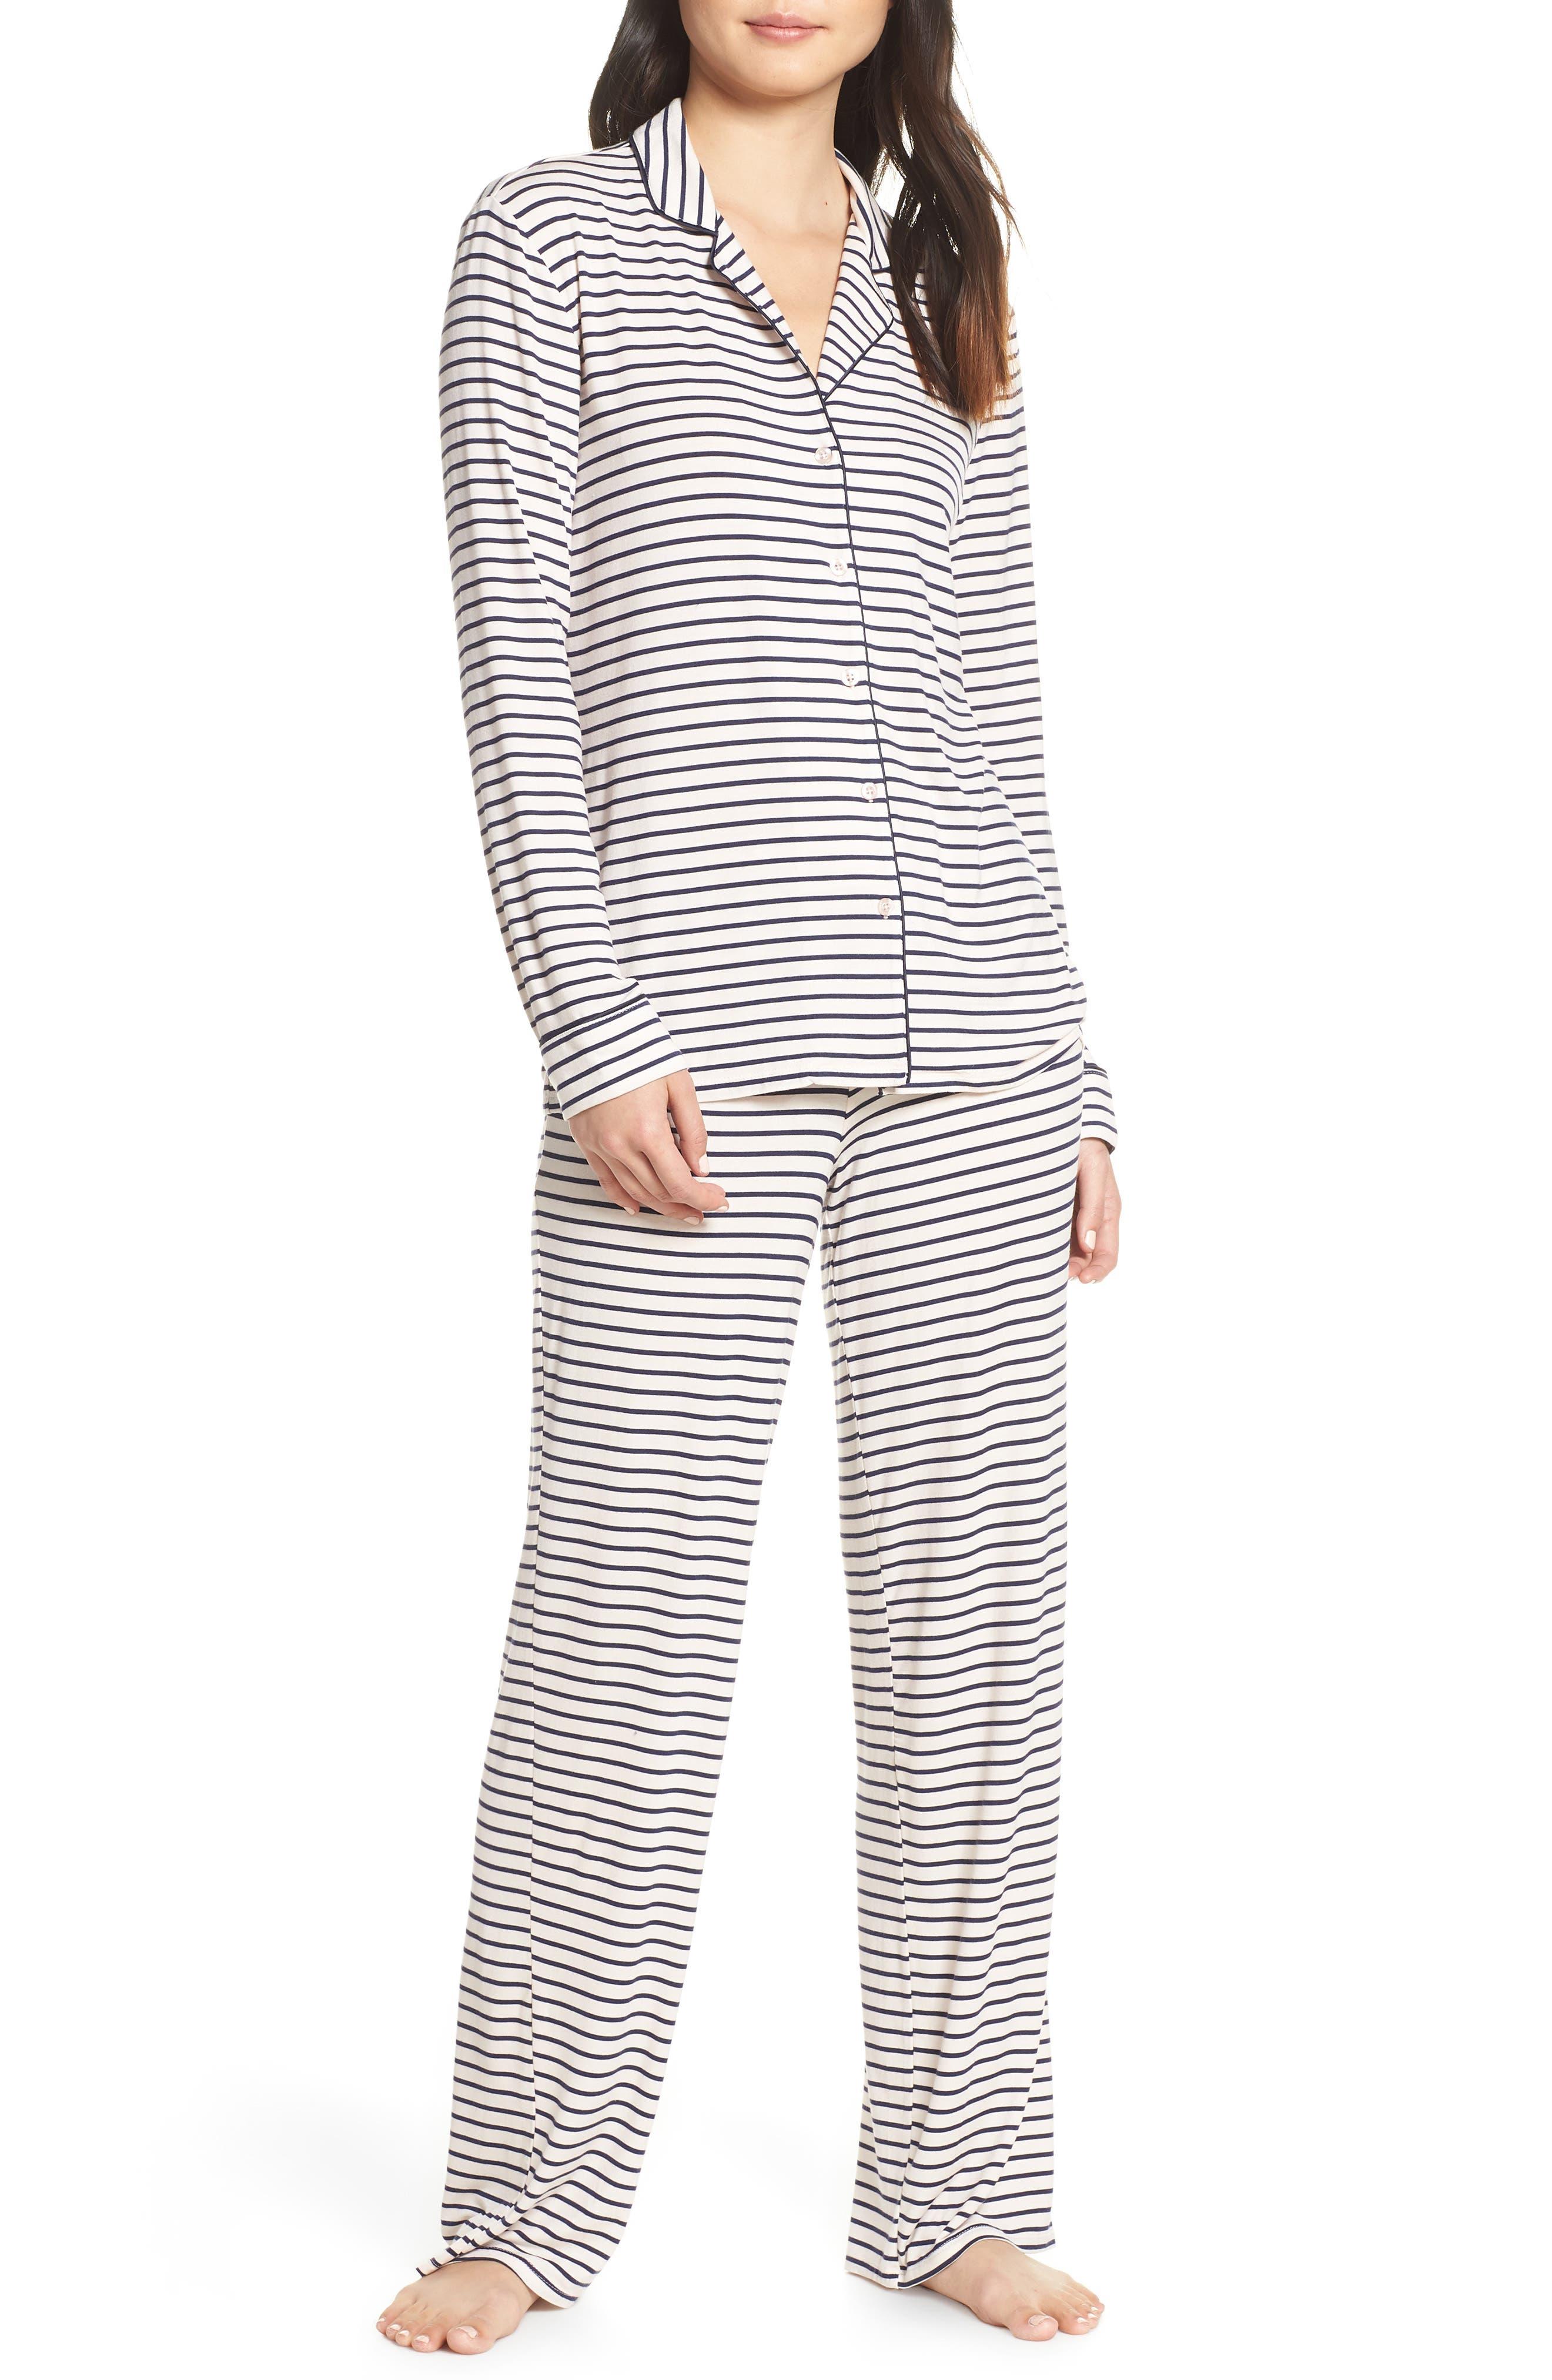 Nordstrom Lingerie Moonlight Pajamas, Pink